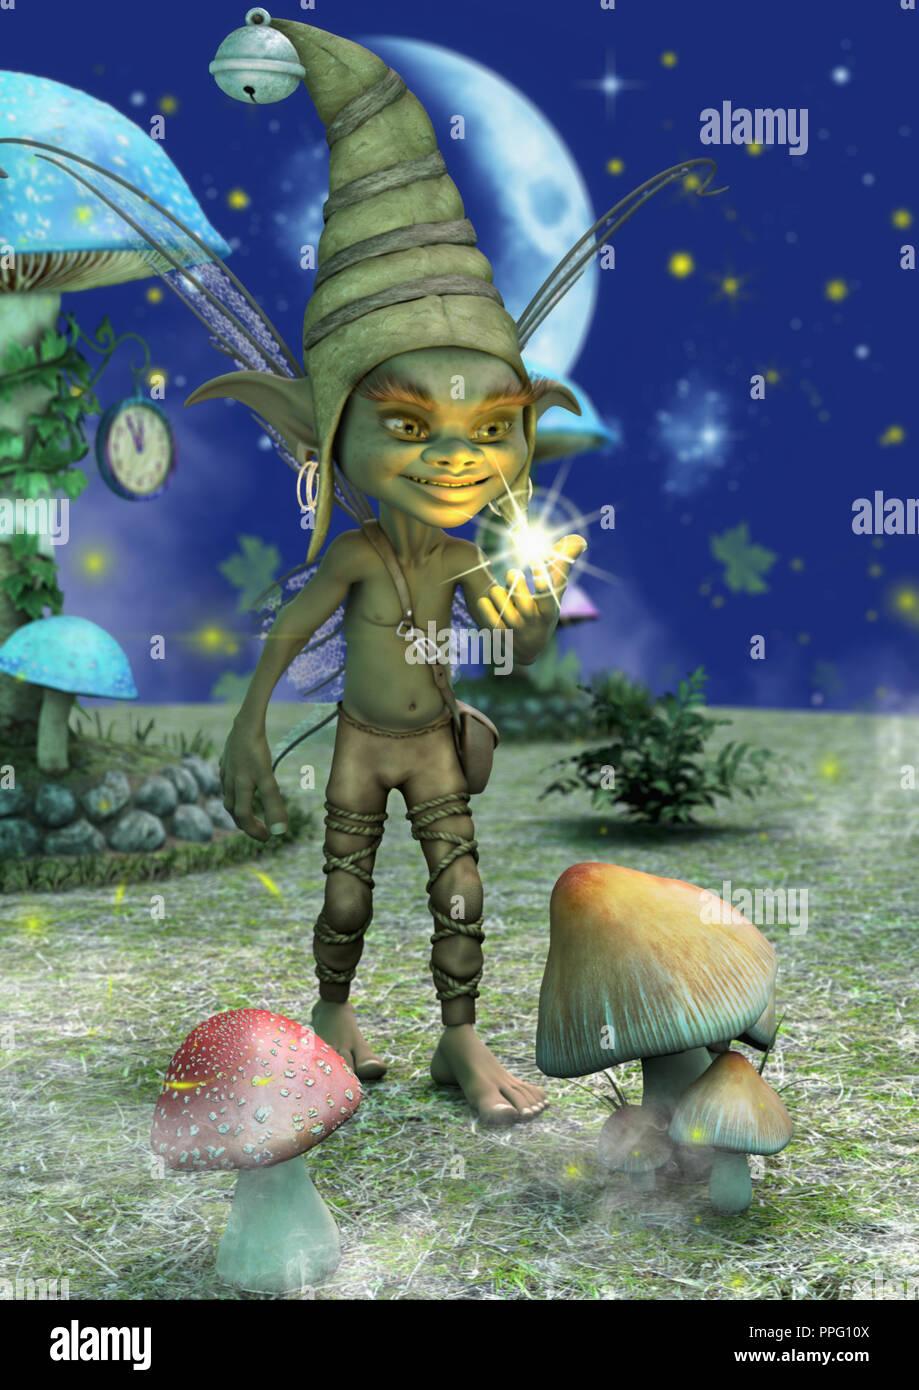 Elf Hat Drawing Stock Photos & Elf Hat Drawing Stock ...